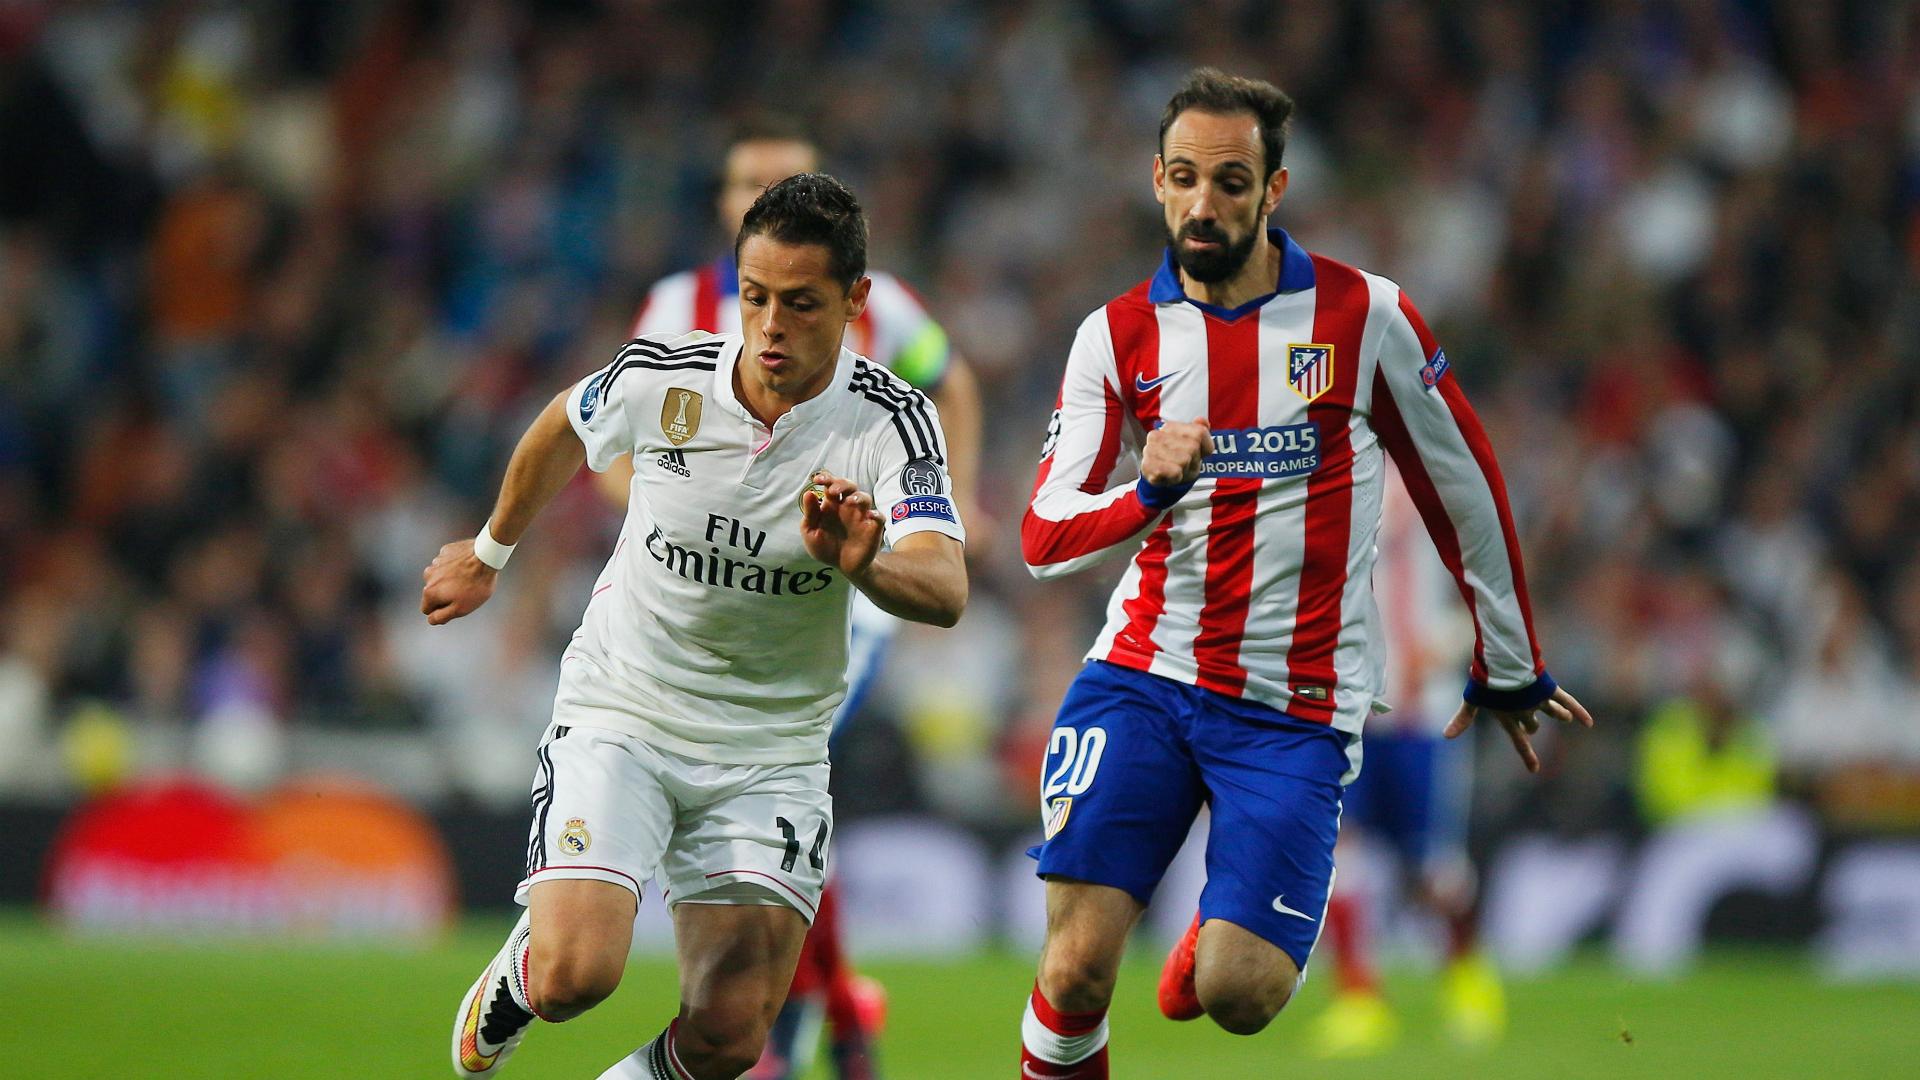 Chicharito Hernandez Juanfran Real Madrid Atletico de Madrid Champions League 04222015